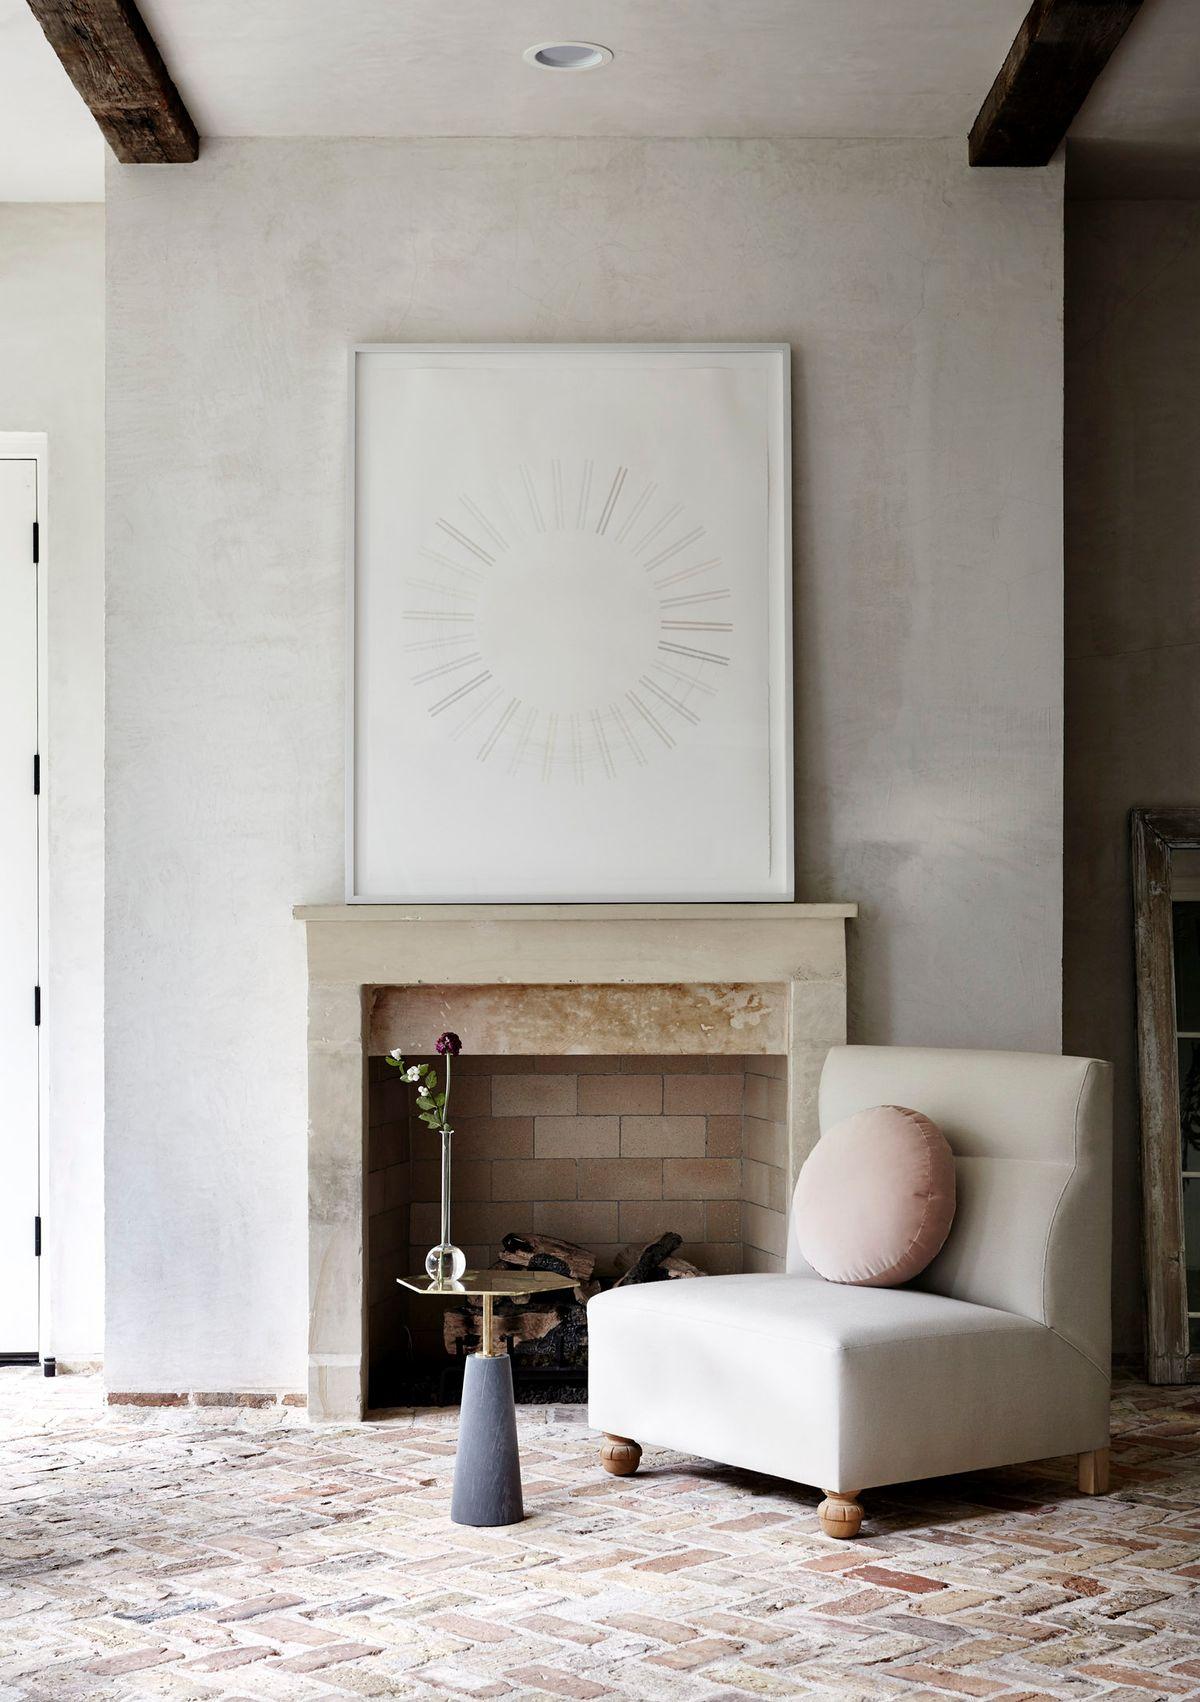 Pär Bengtsson Home Interior Editorial Photography20.jpg